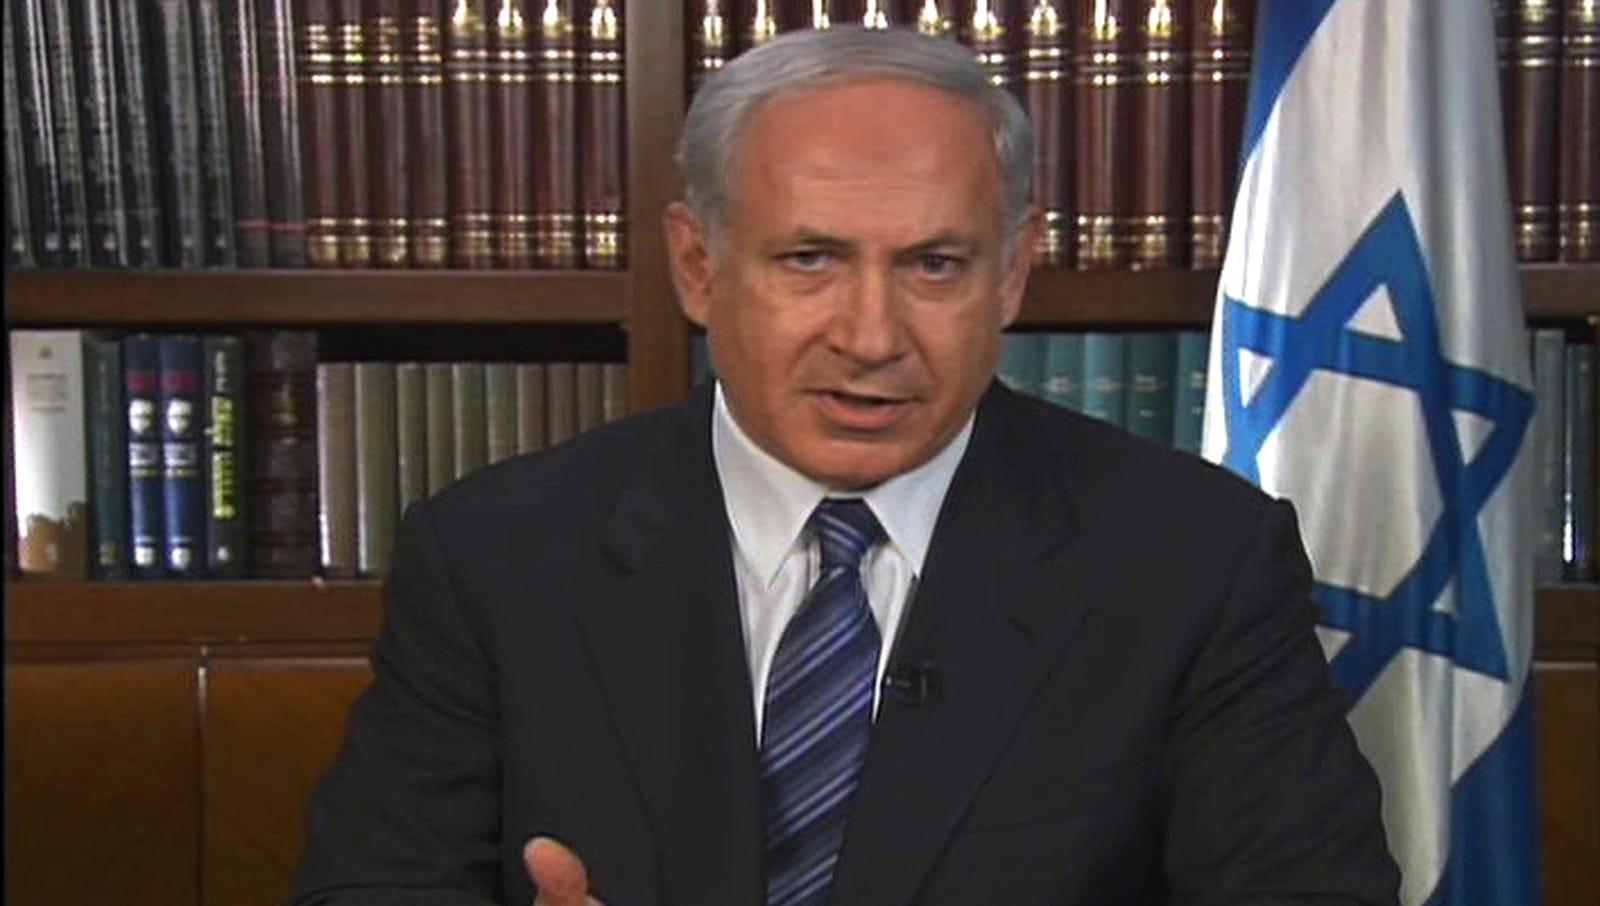 Netanyahu Assures Critics He Still Has Utmost Respect For U.S. Money